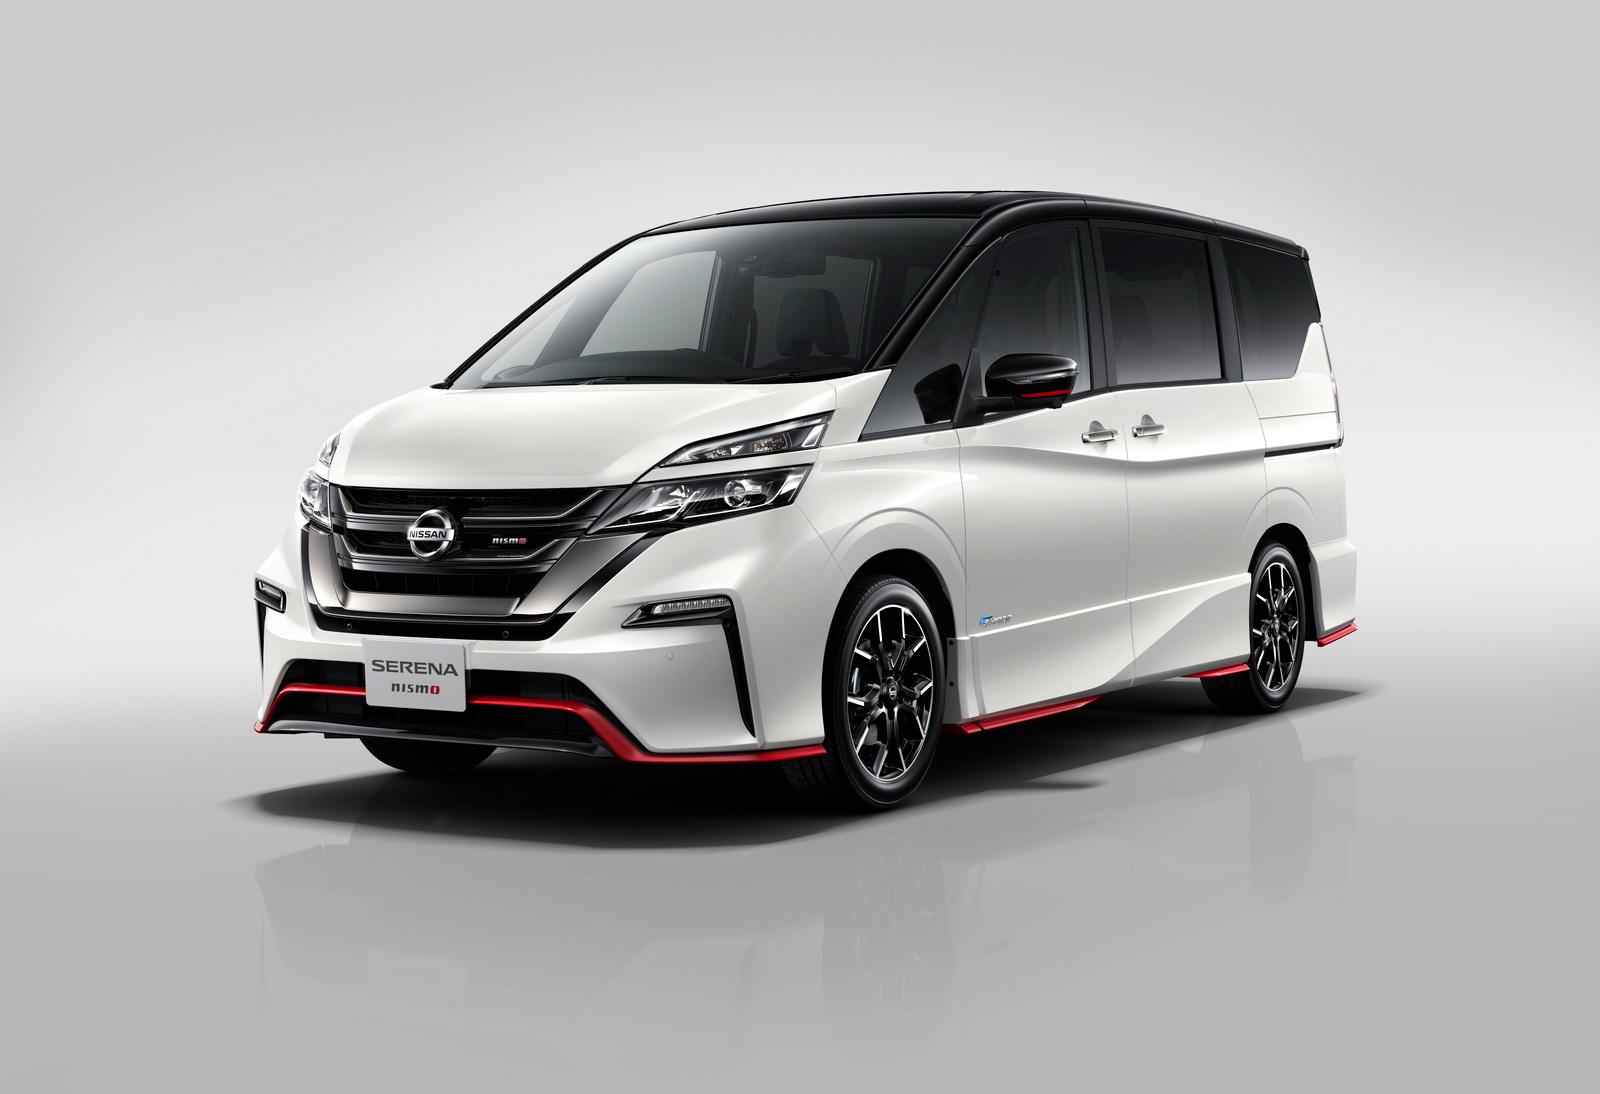 Nissan_Serena_Nismo_01